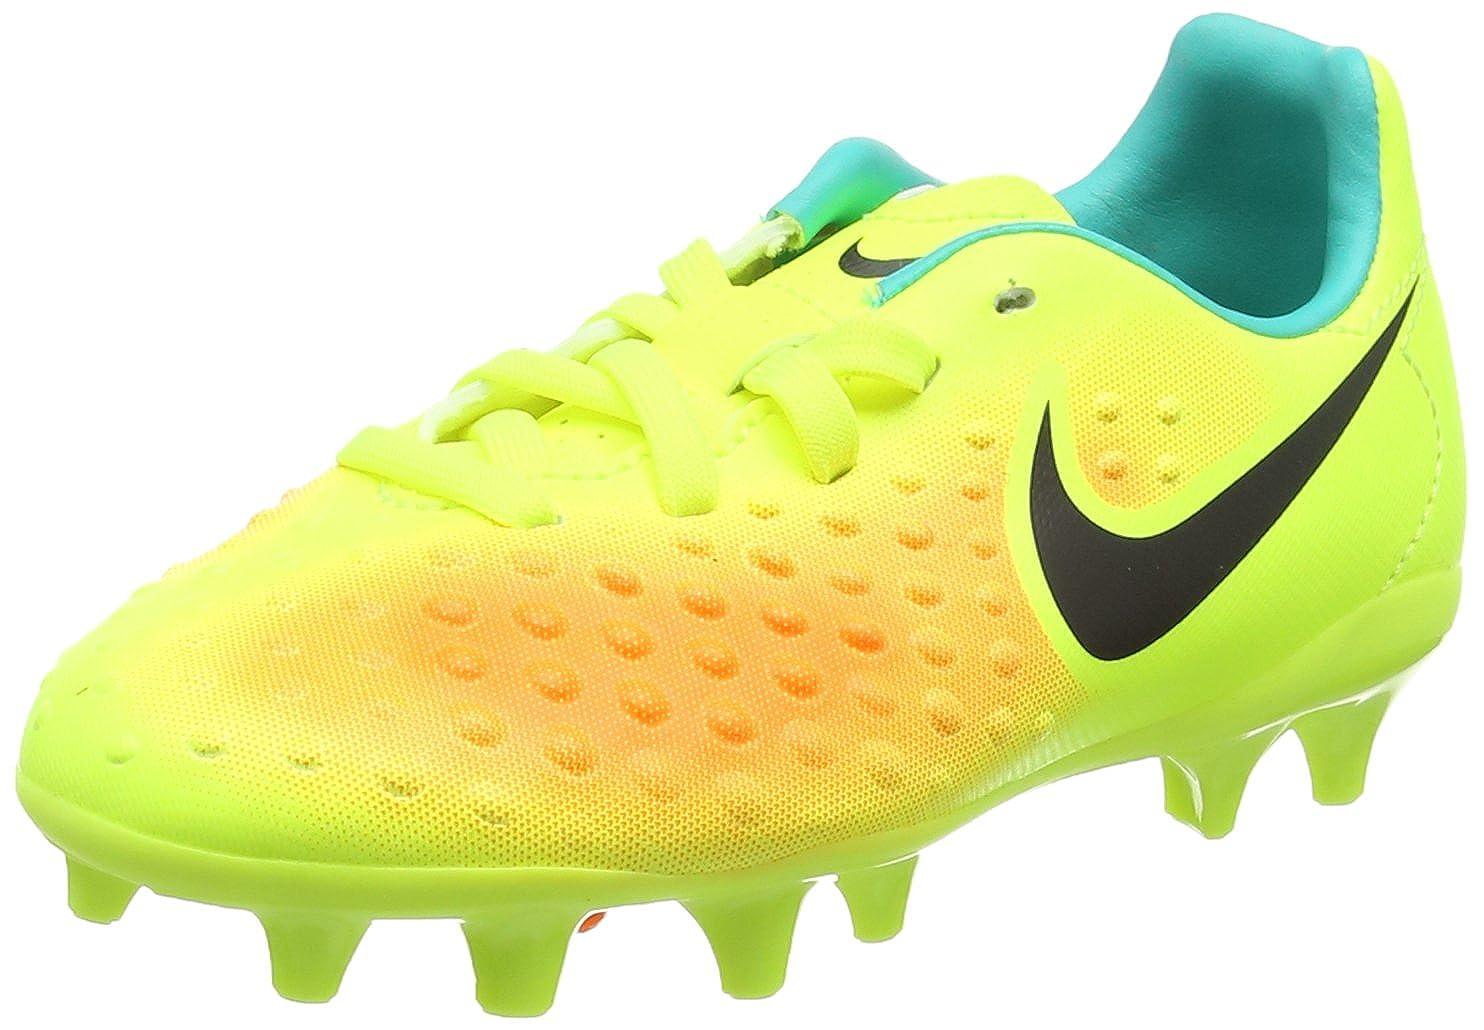 5d1e62ab035e NIKE Unisex Kids' Jr Magista Opus Ii Fg Football Boots, Multicolor  (Volt/Total Orange/Clear Jade/Black), 9.5 Child UK 27 EU: Amazon.co.uk:  Shoes & Bags